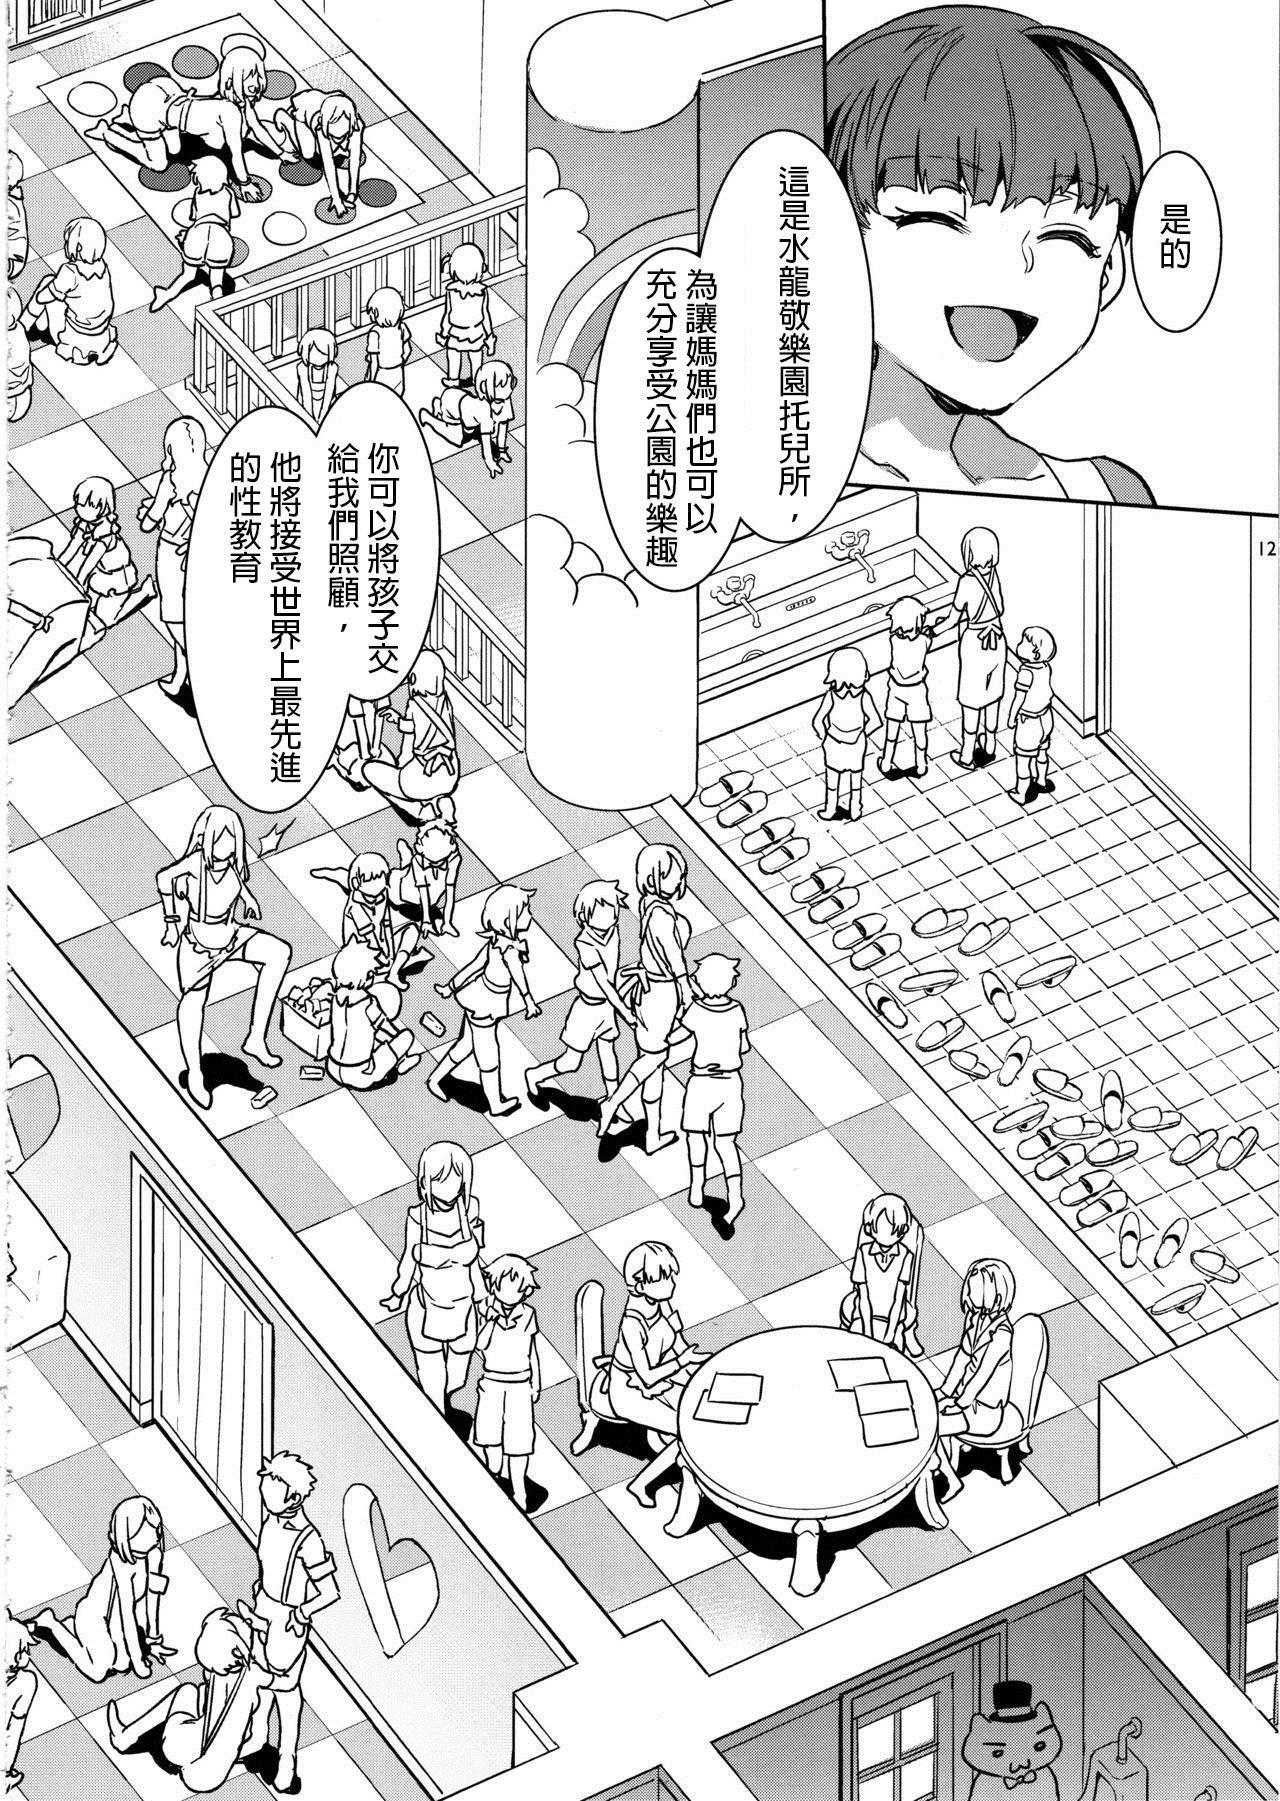 Oideyo! Mizuryu Kei Land the 8th day 10